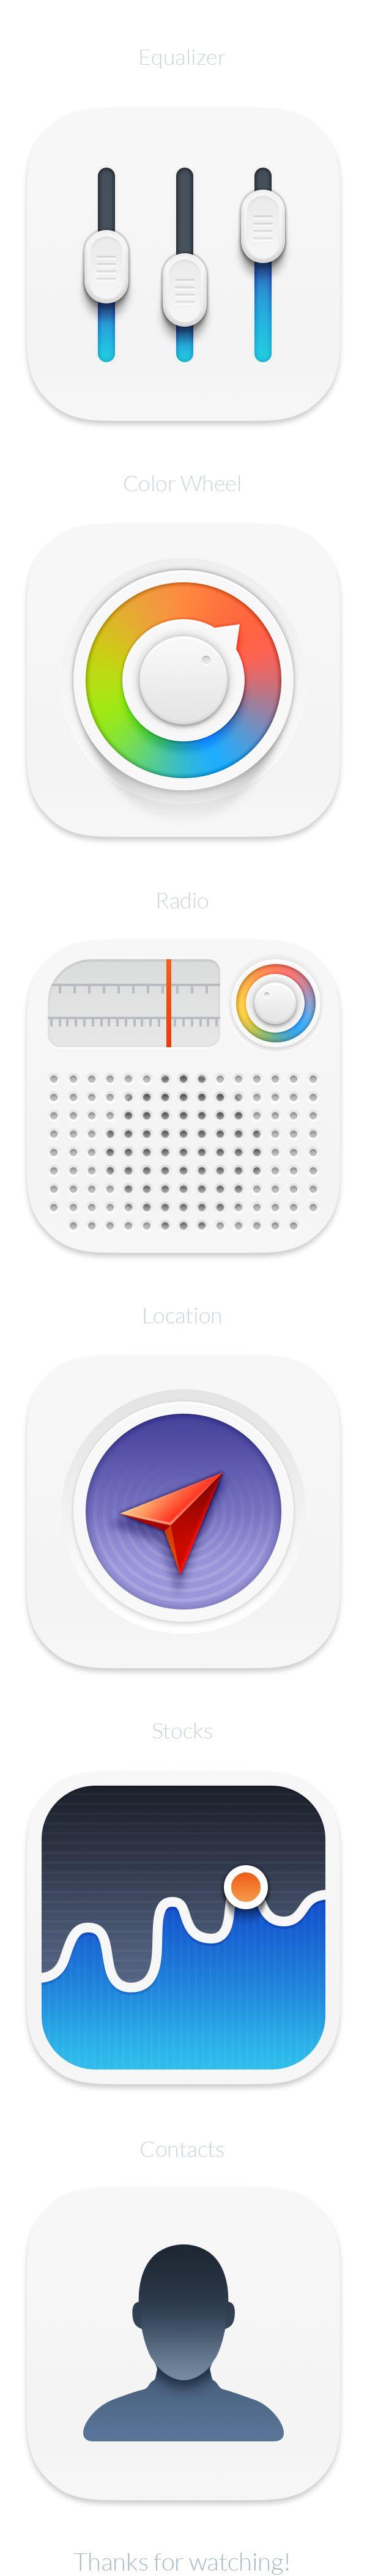 #iOS 7 Minimanimal icon proposal |Jackie Tran Anh, via Behance